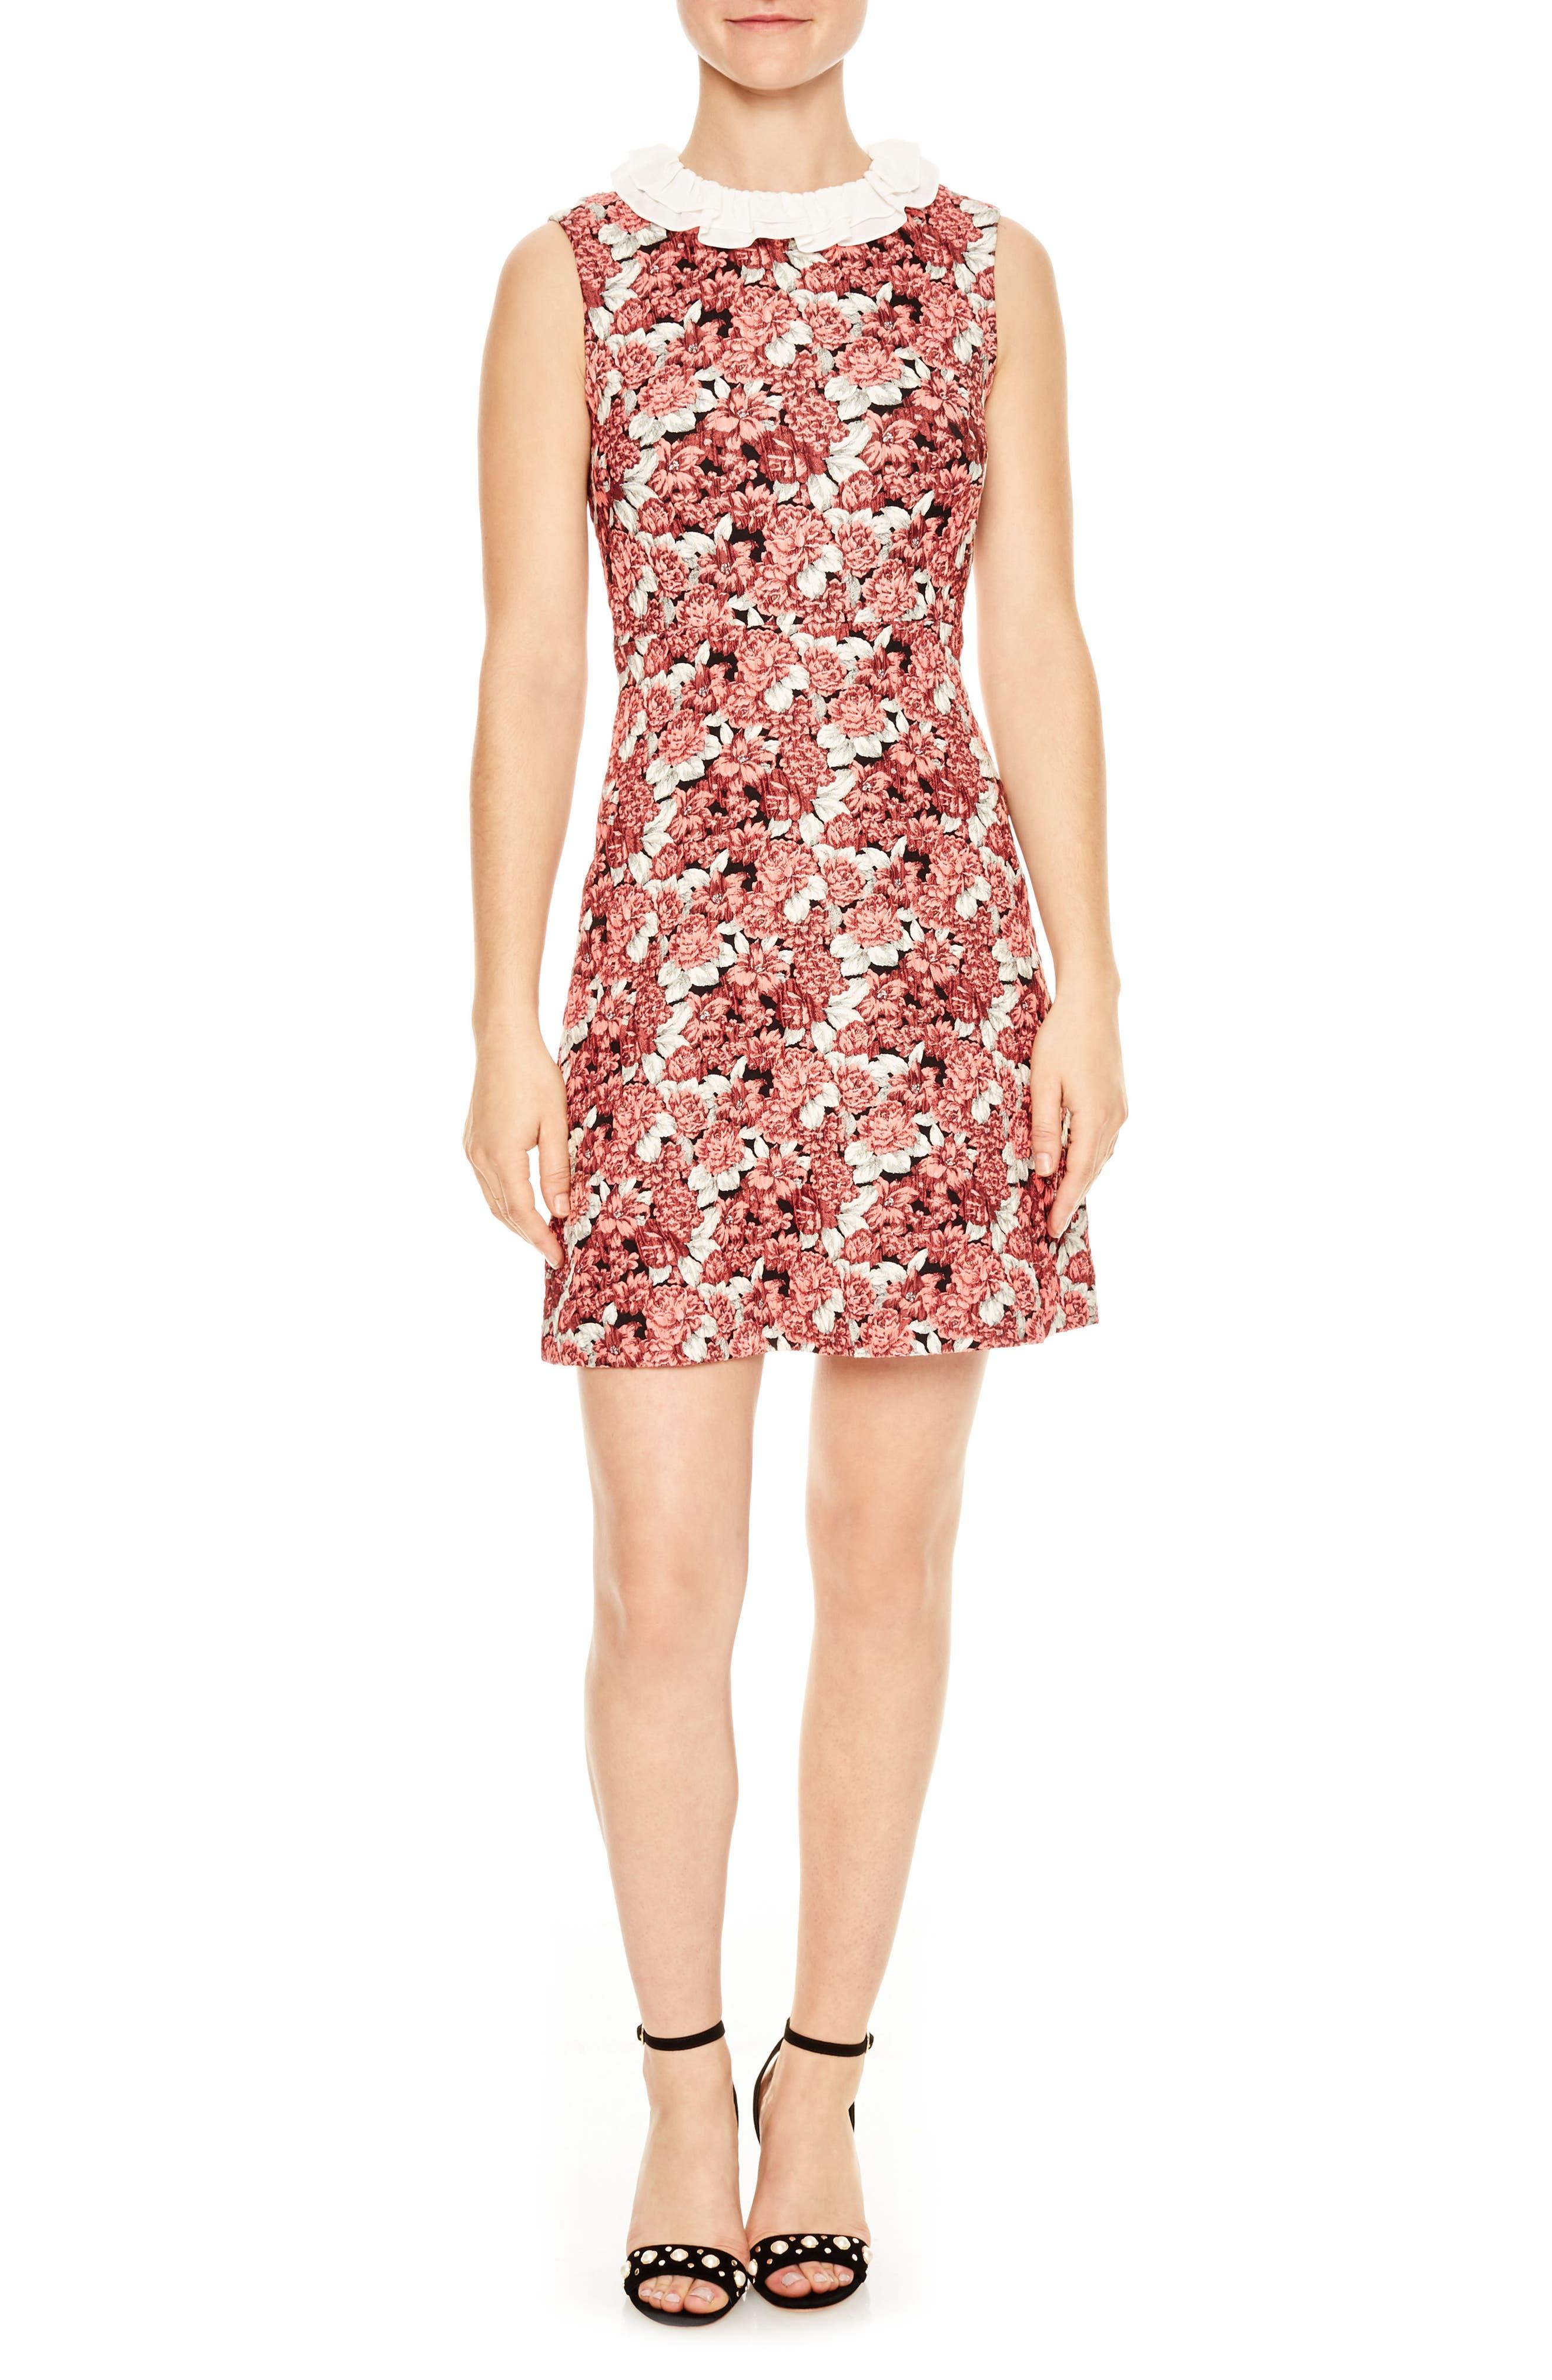 Edwige Floral Print Sheath Dress,                             Main thumbnail 1, color,                             Pink